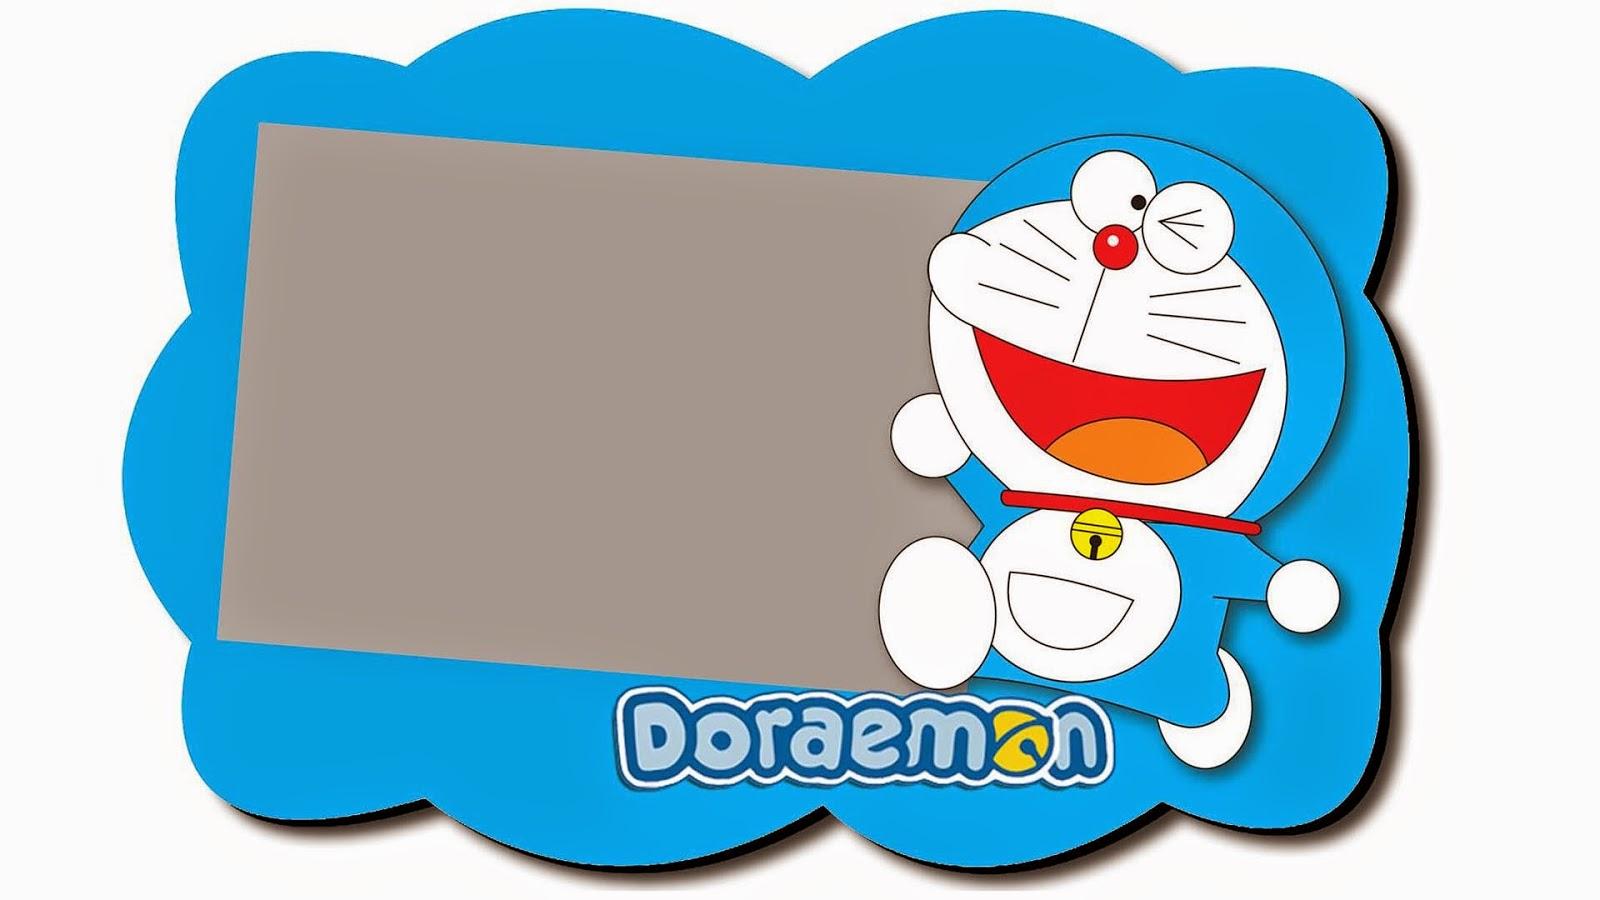 Wallpaper Iphone Hd Keren Gambar Doraemon Buat Wallpaper Hp Kampung Wallpaper